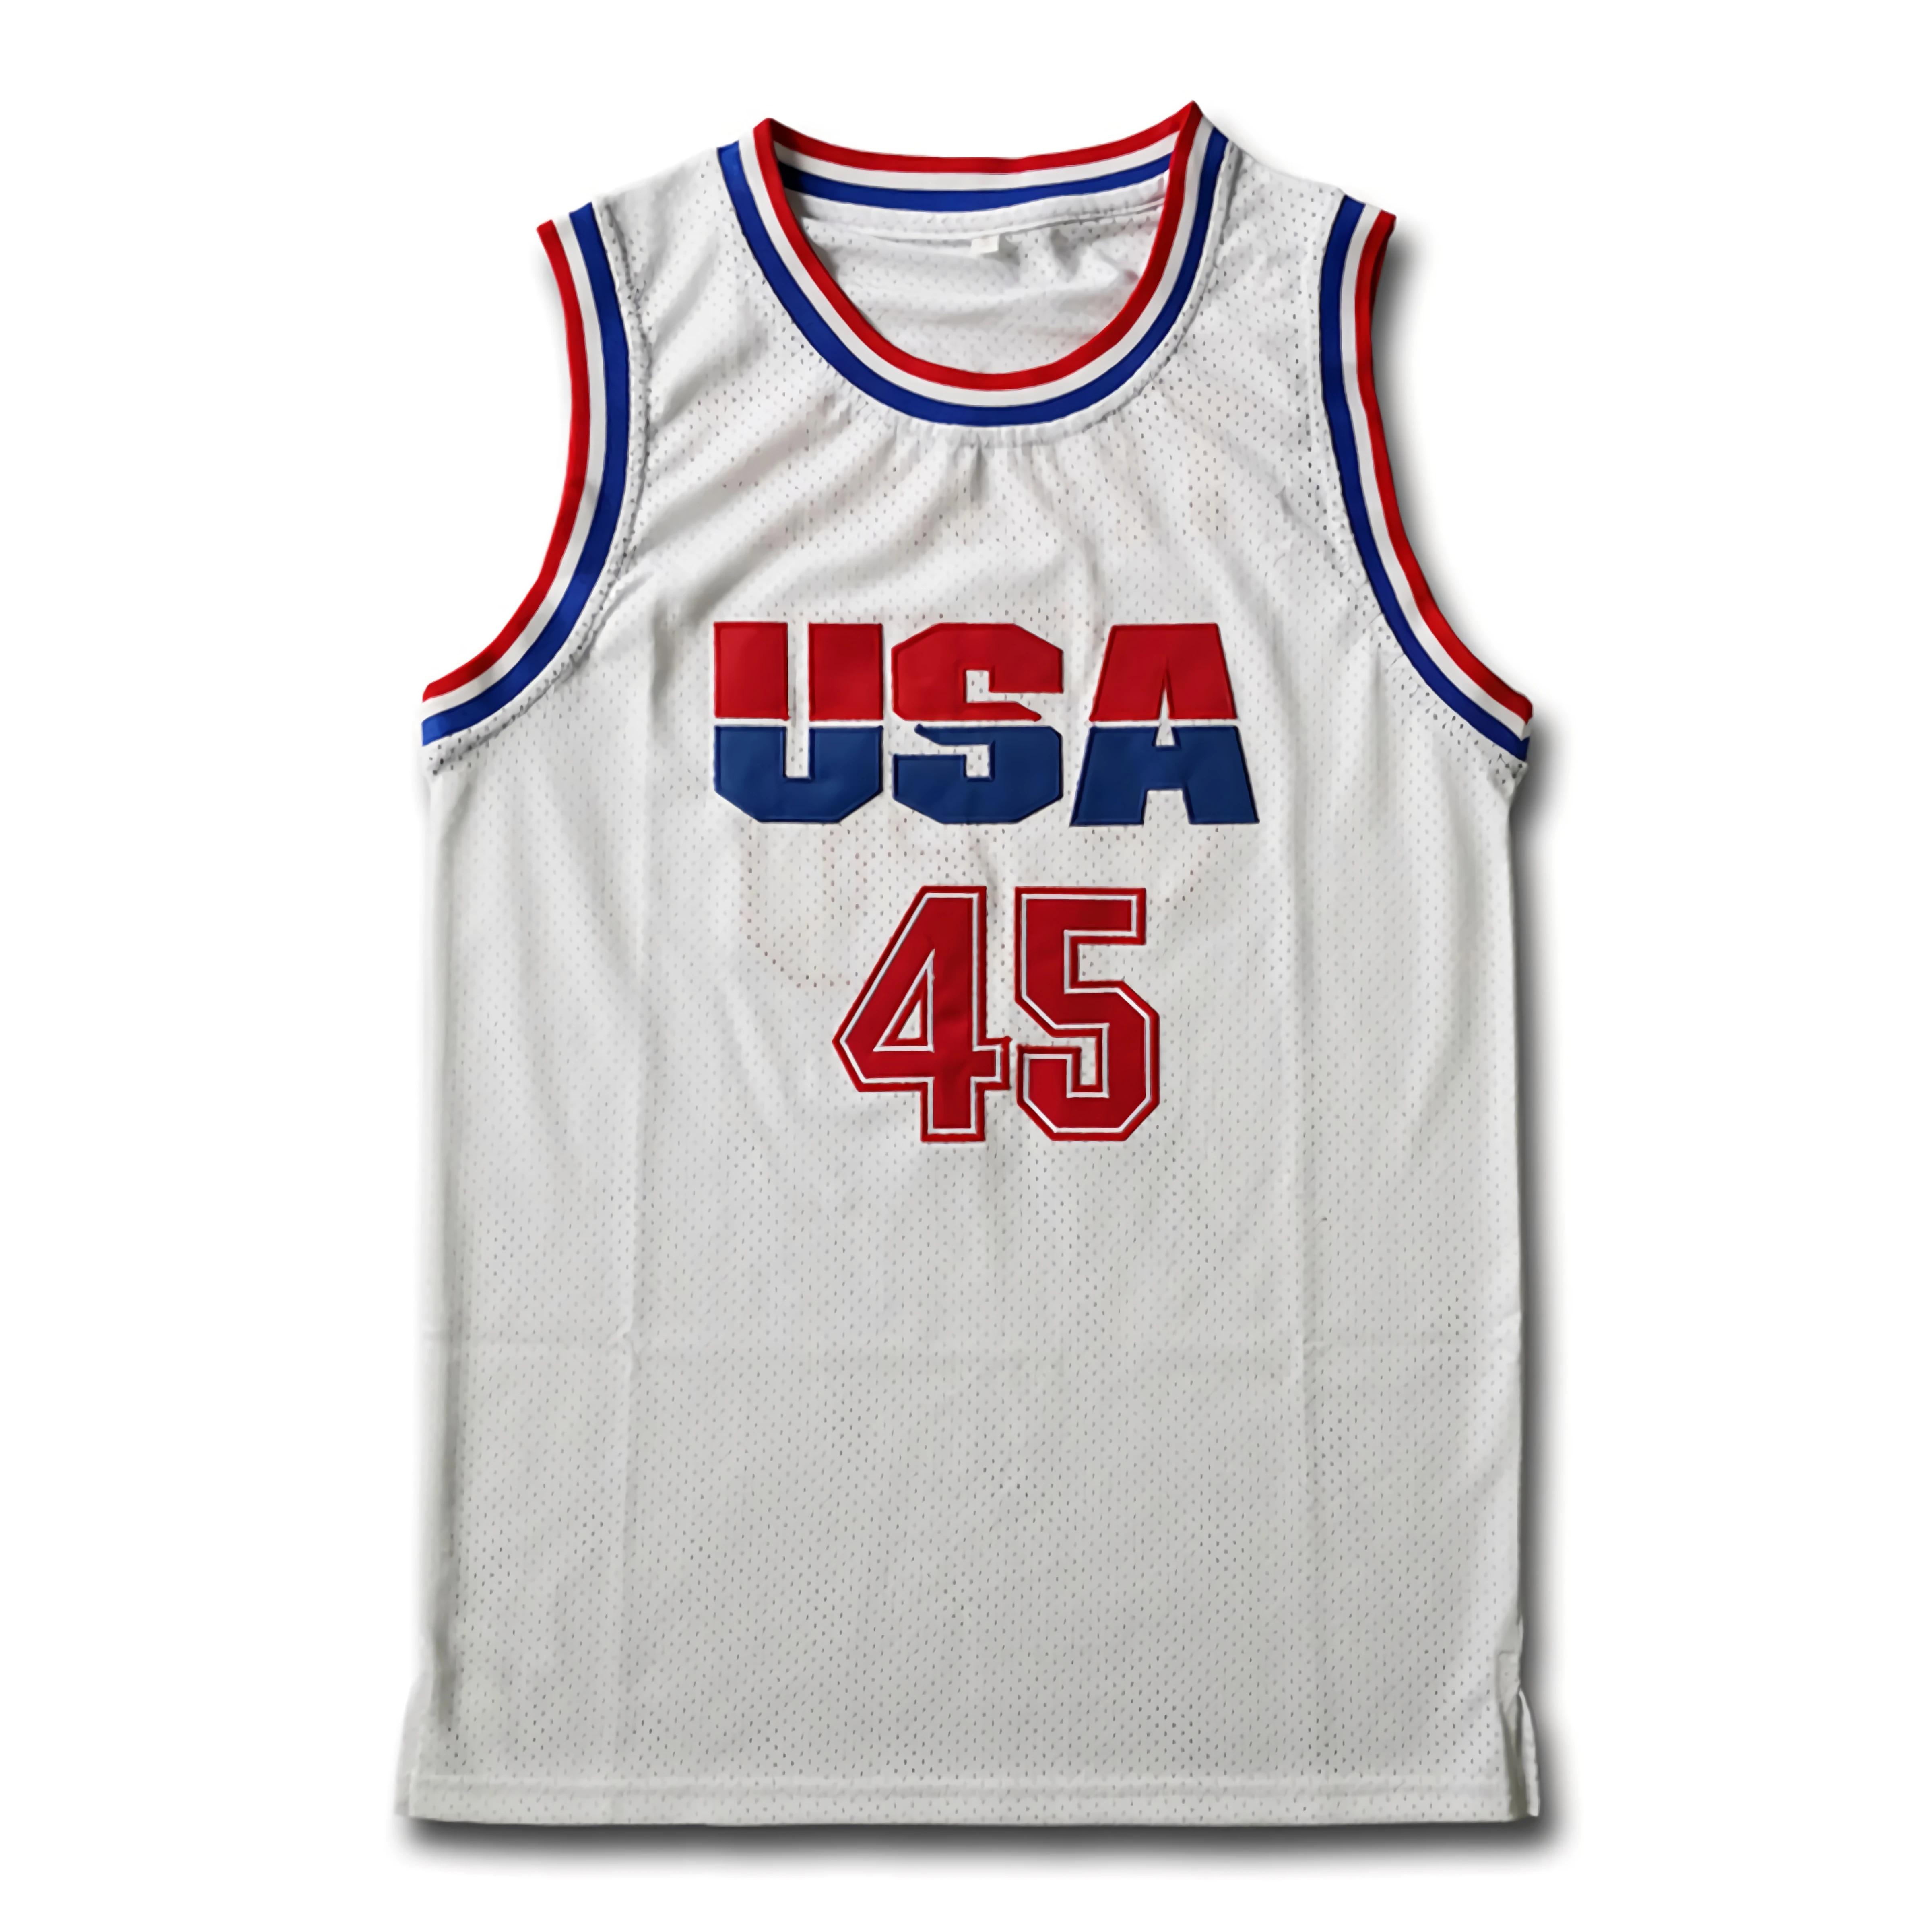 Mens USA Basketball Jerseys Donald Trump 45 Jersey 2016 Commemorative Edition Donald Trump Stitched White Shirts